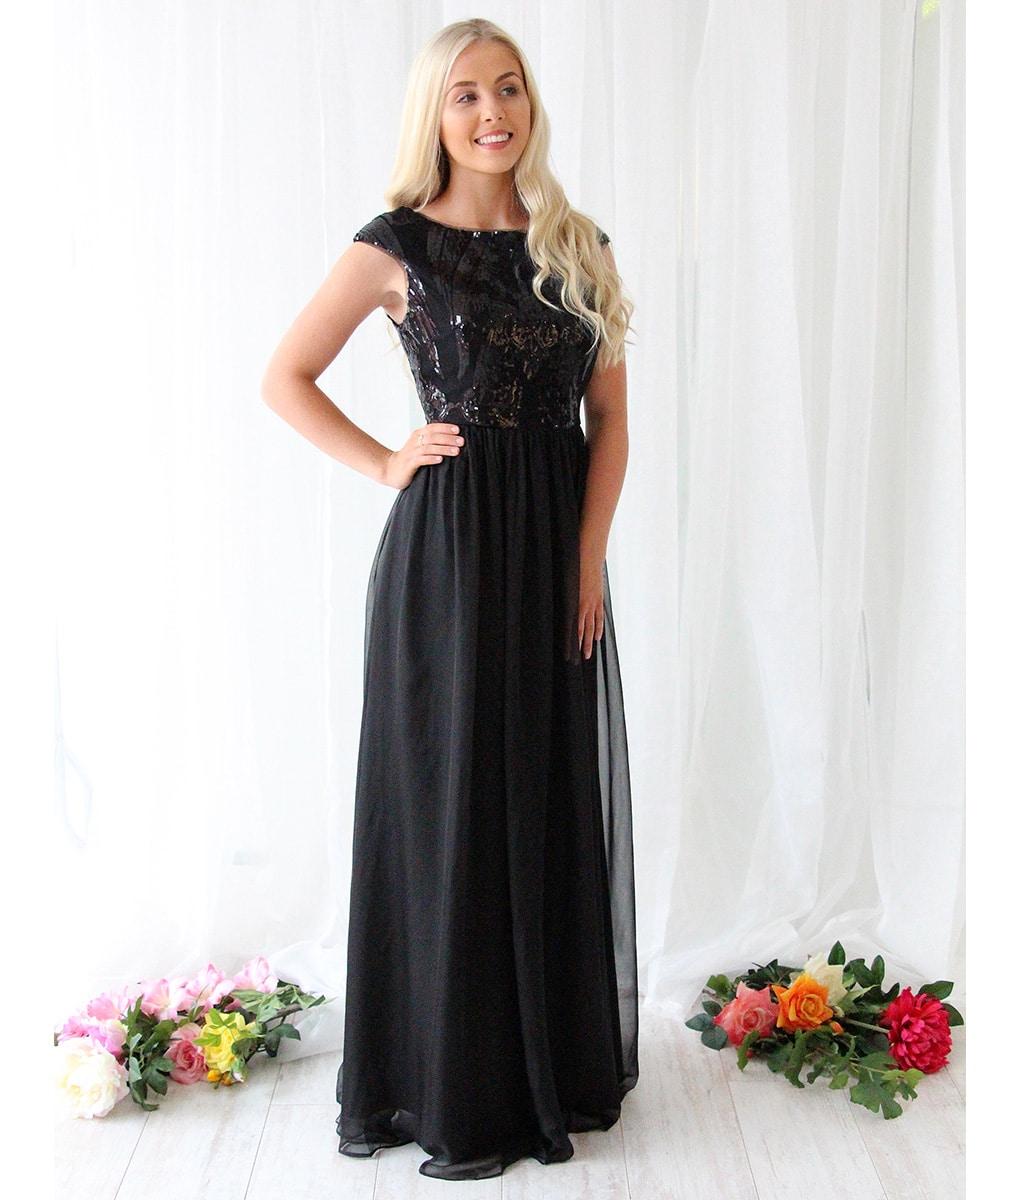 Alila-Black-Sequin-Chiffon-Long-Dress-Bariano